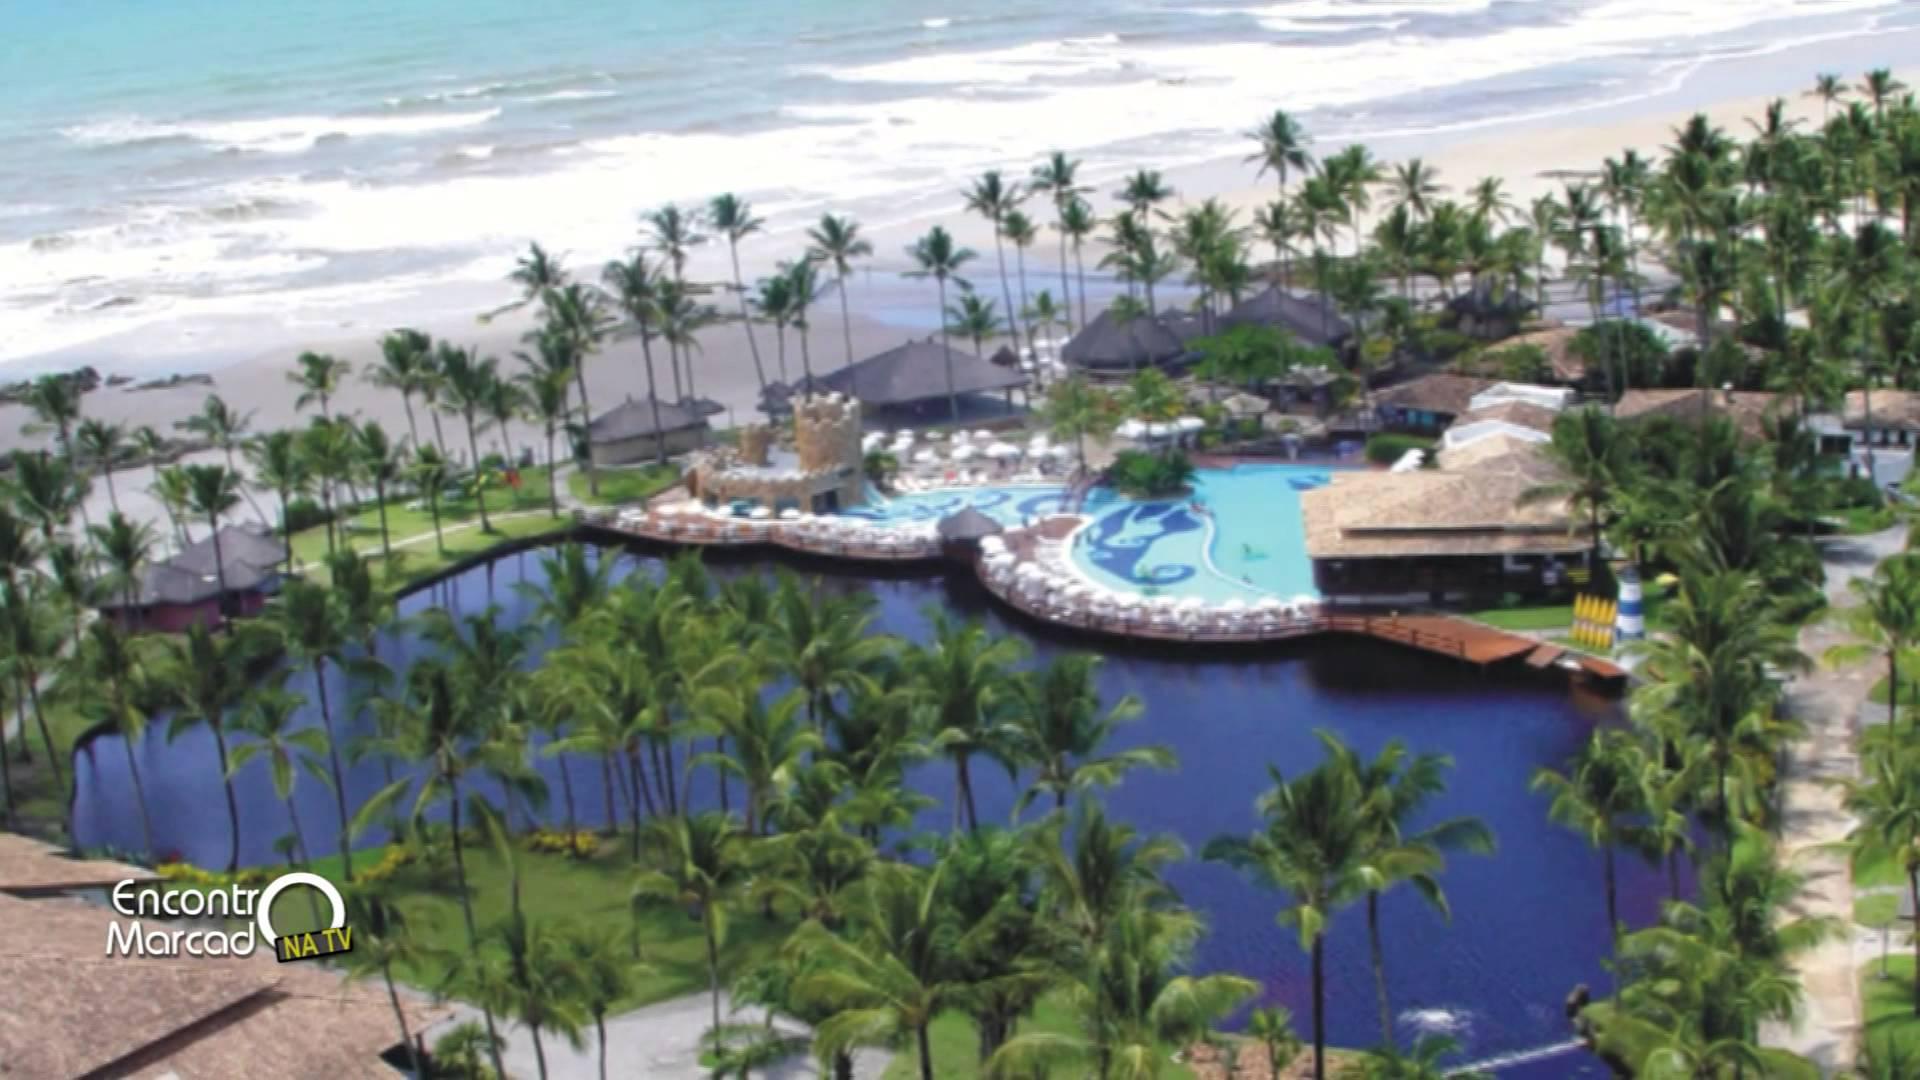 Cana Brava All Inclusive Resort - Ilhéus Bahia - YouTube